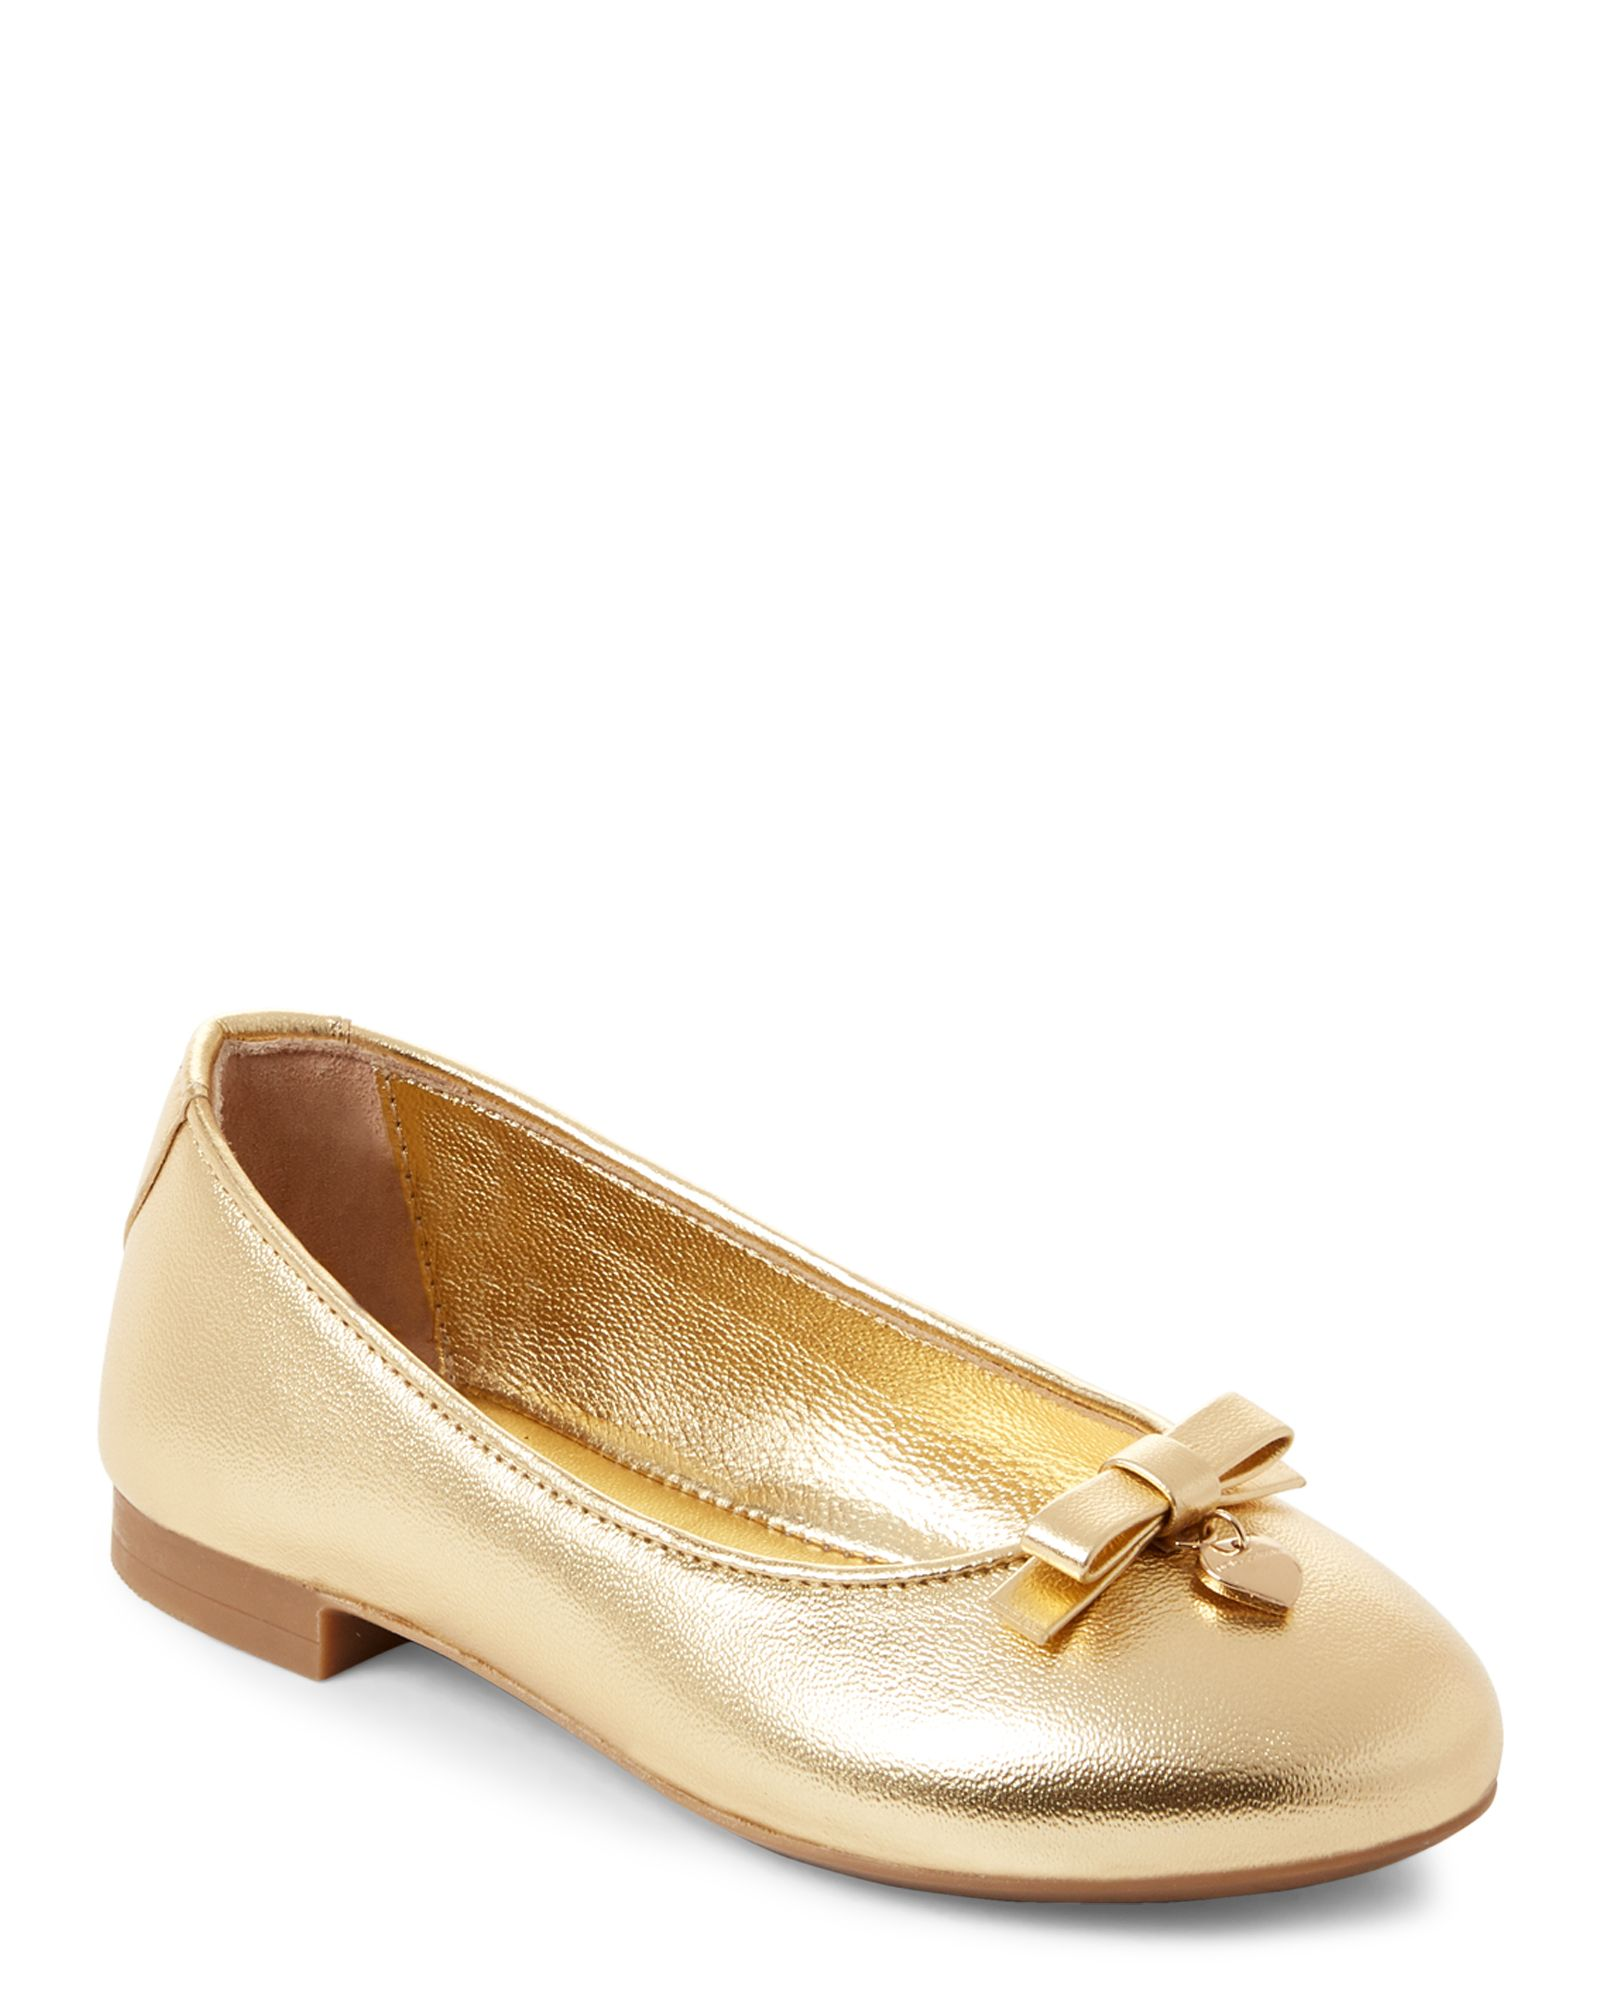 Dolce\u0026Gabbana (Toddler/Kids Girls) Gold